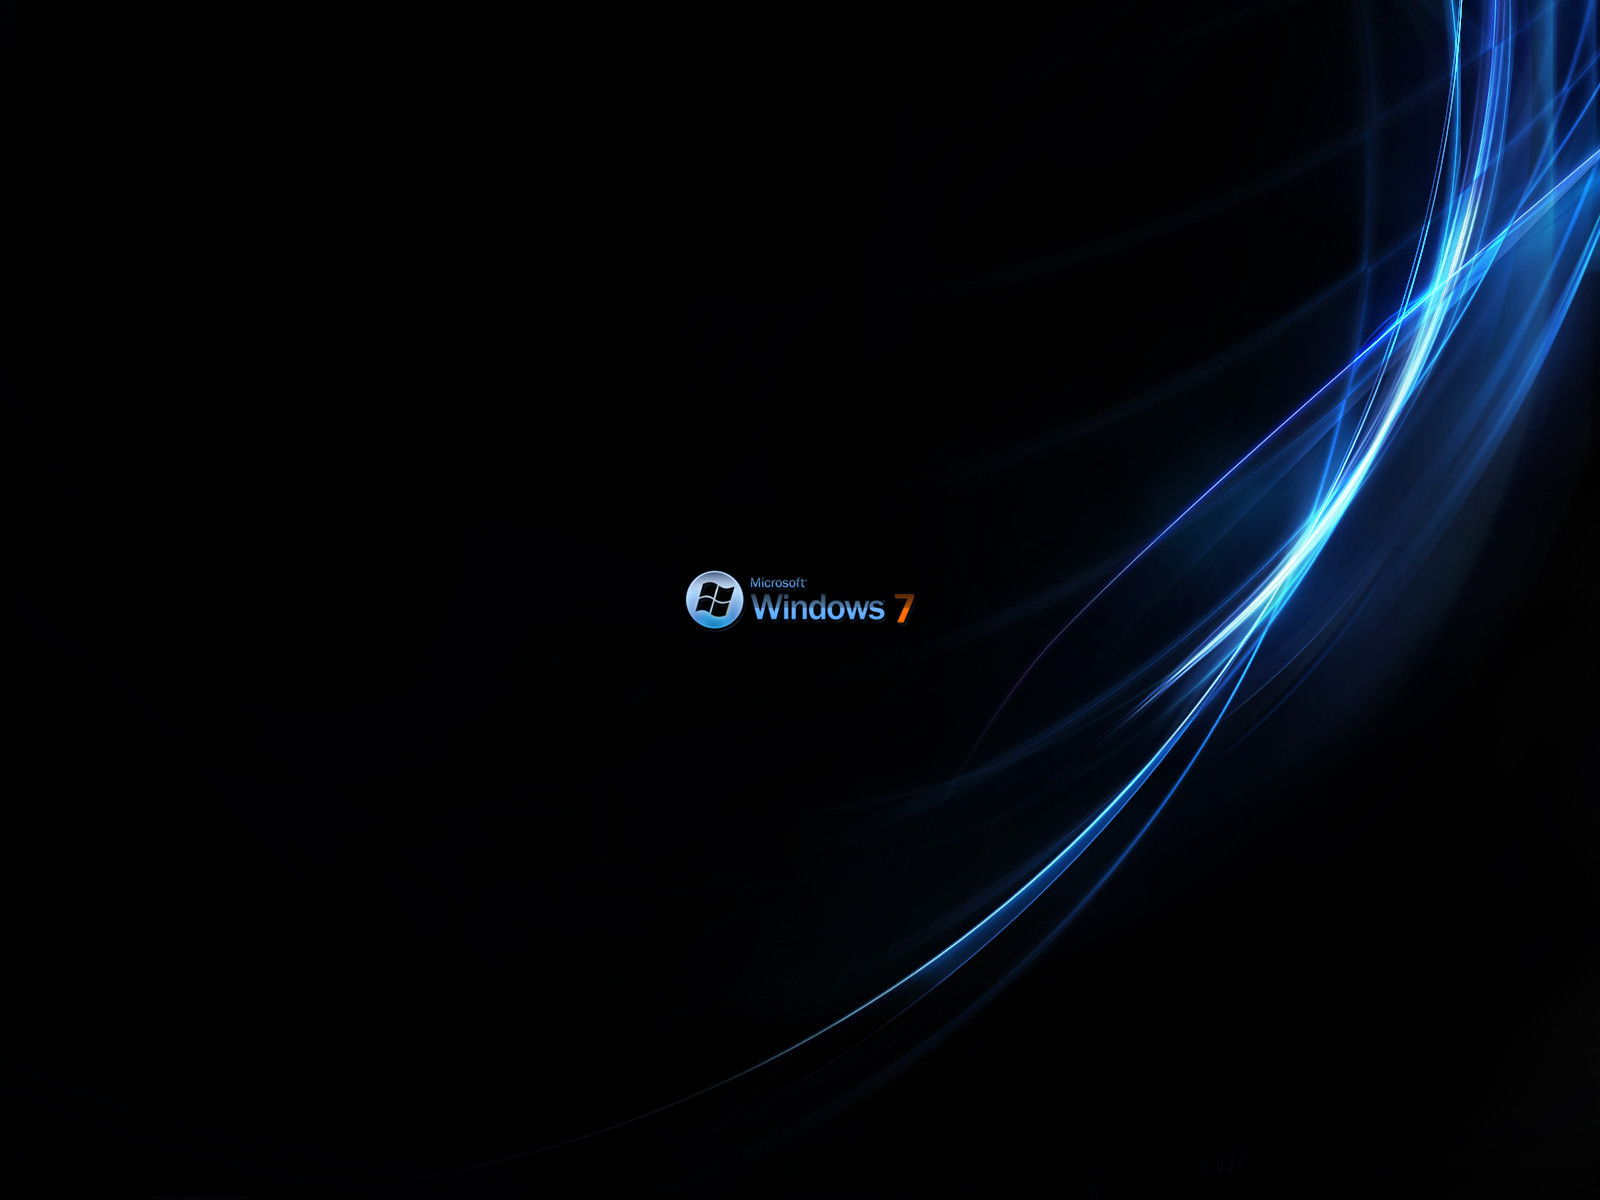 http://2.bp.blogspot.com/-Ov5a7-Rd-gI/TvJ-Ldh2RCI/AAAAAAAAAME/gD2JC-IVawQ/s1600/Black-Windows-7.jpg